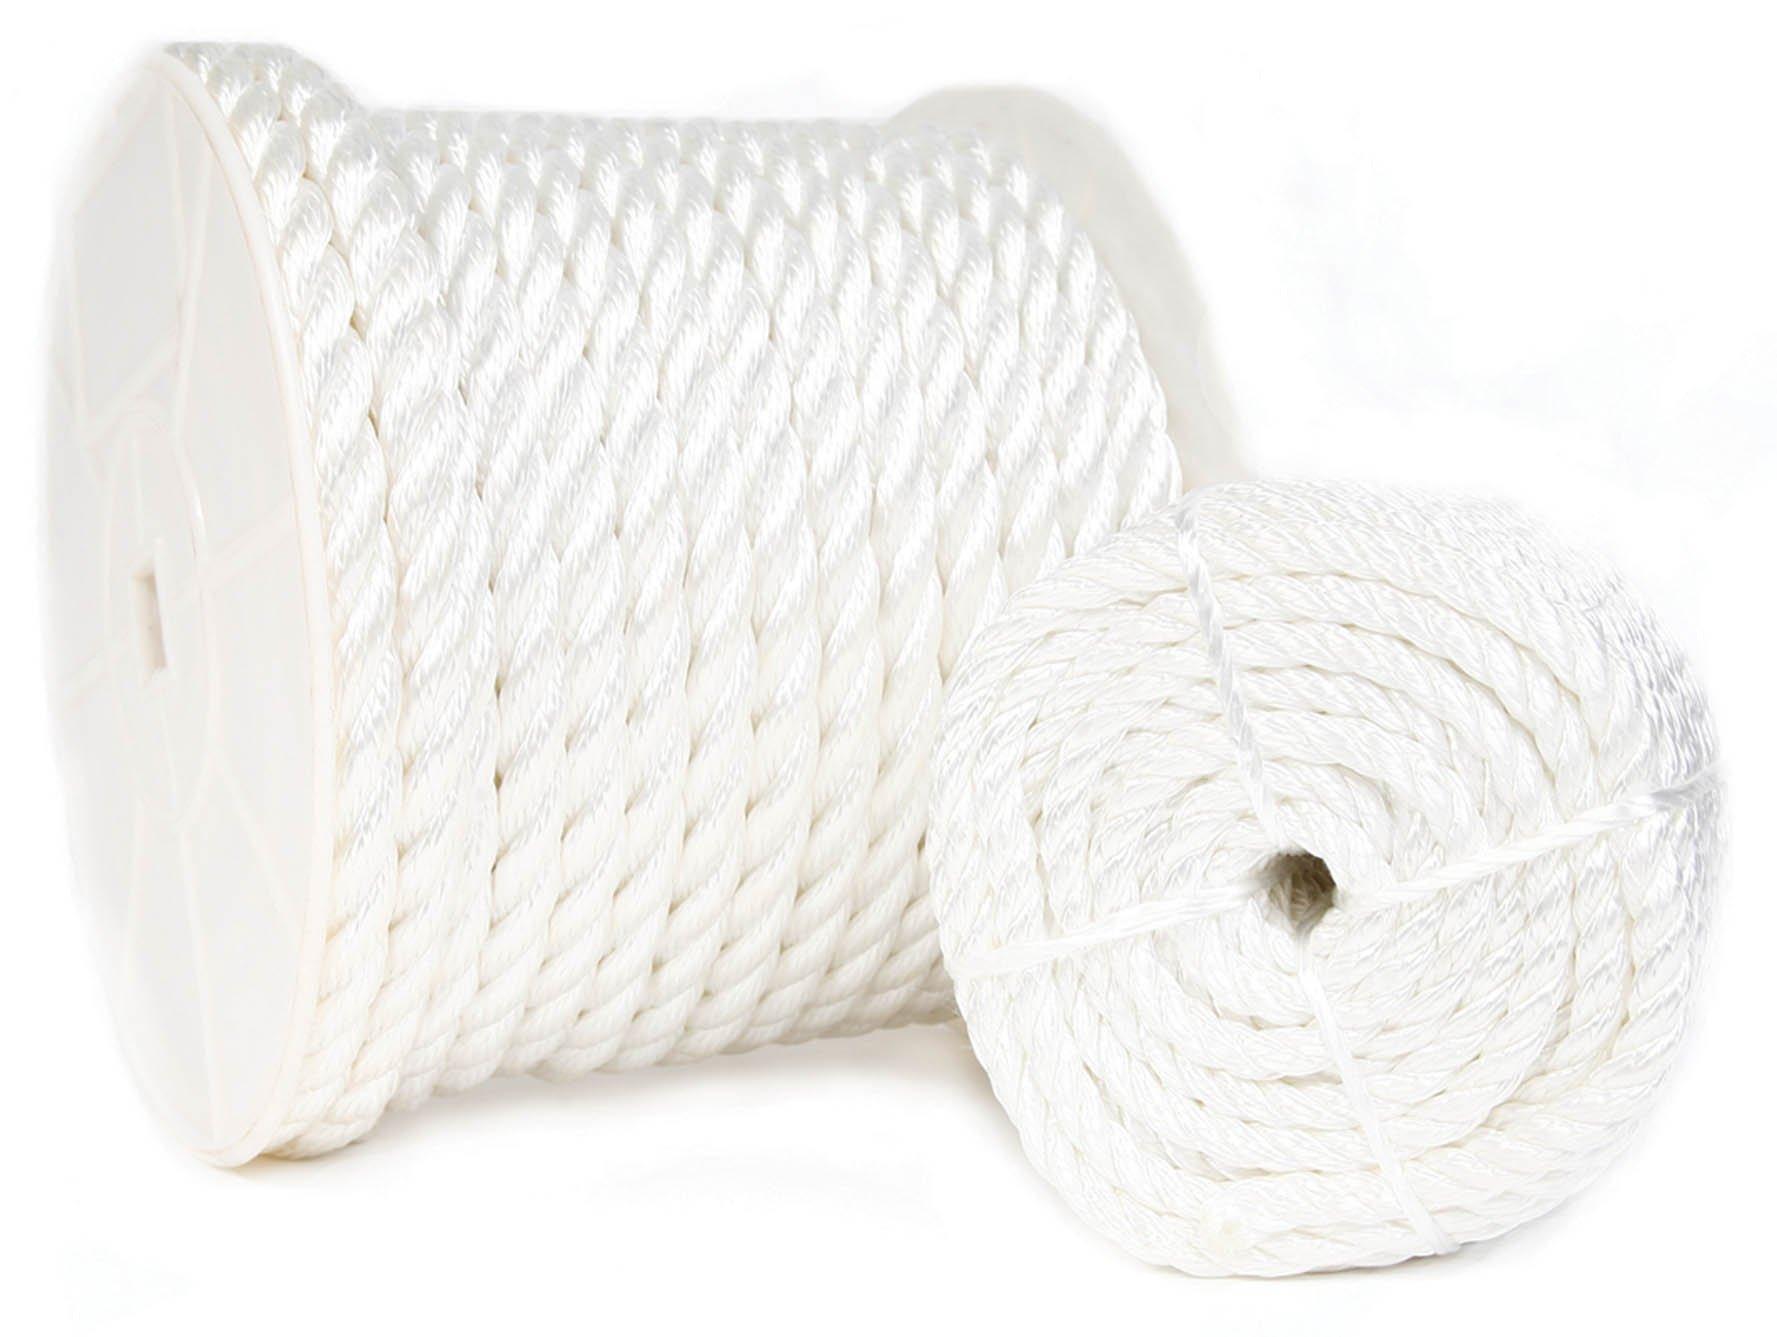 KOCH 5210844 4.5-Inch 1/4 X 300 Twisted Nylon Rope, White